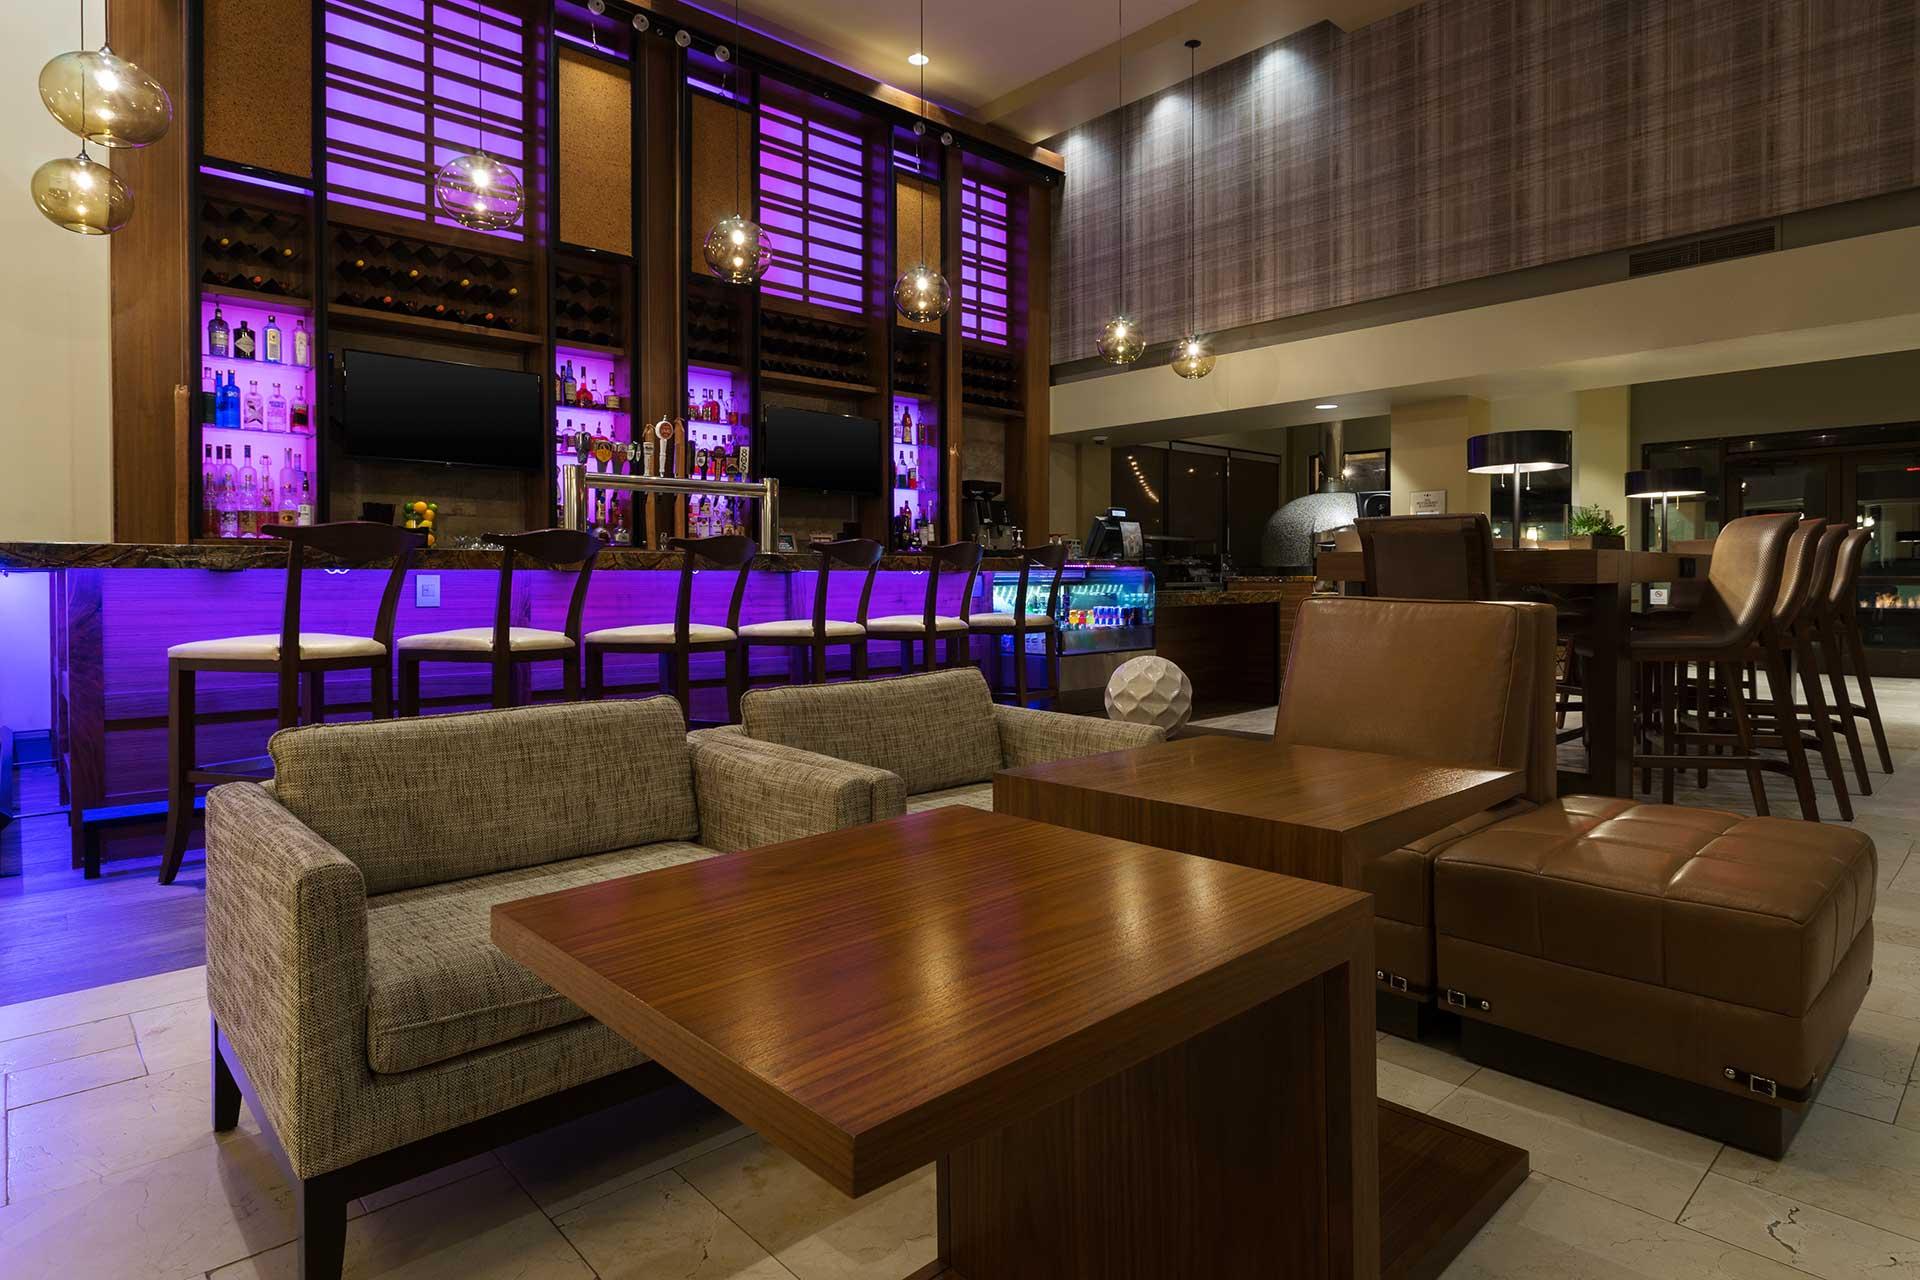 555 Lounge & Bar at the Santa Ynez Valley Marriott